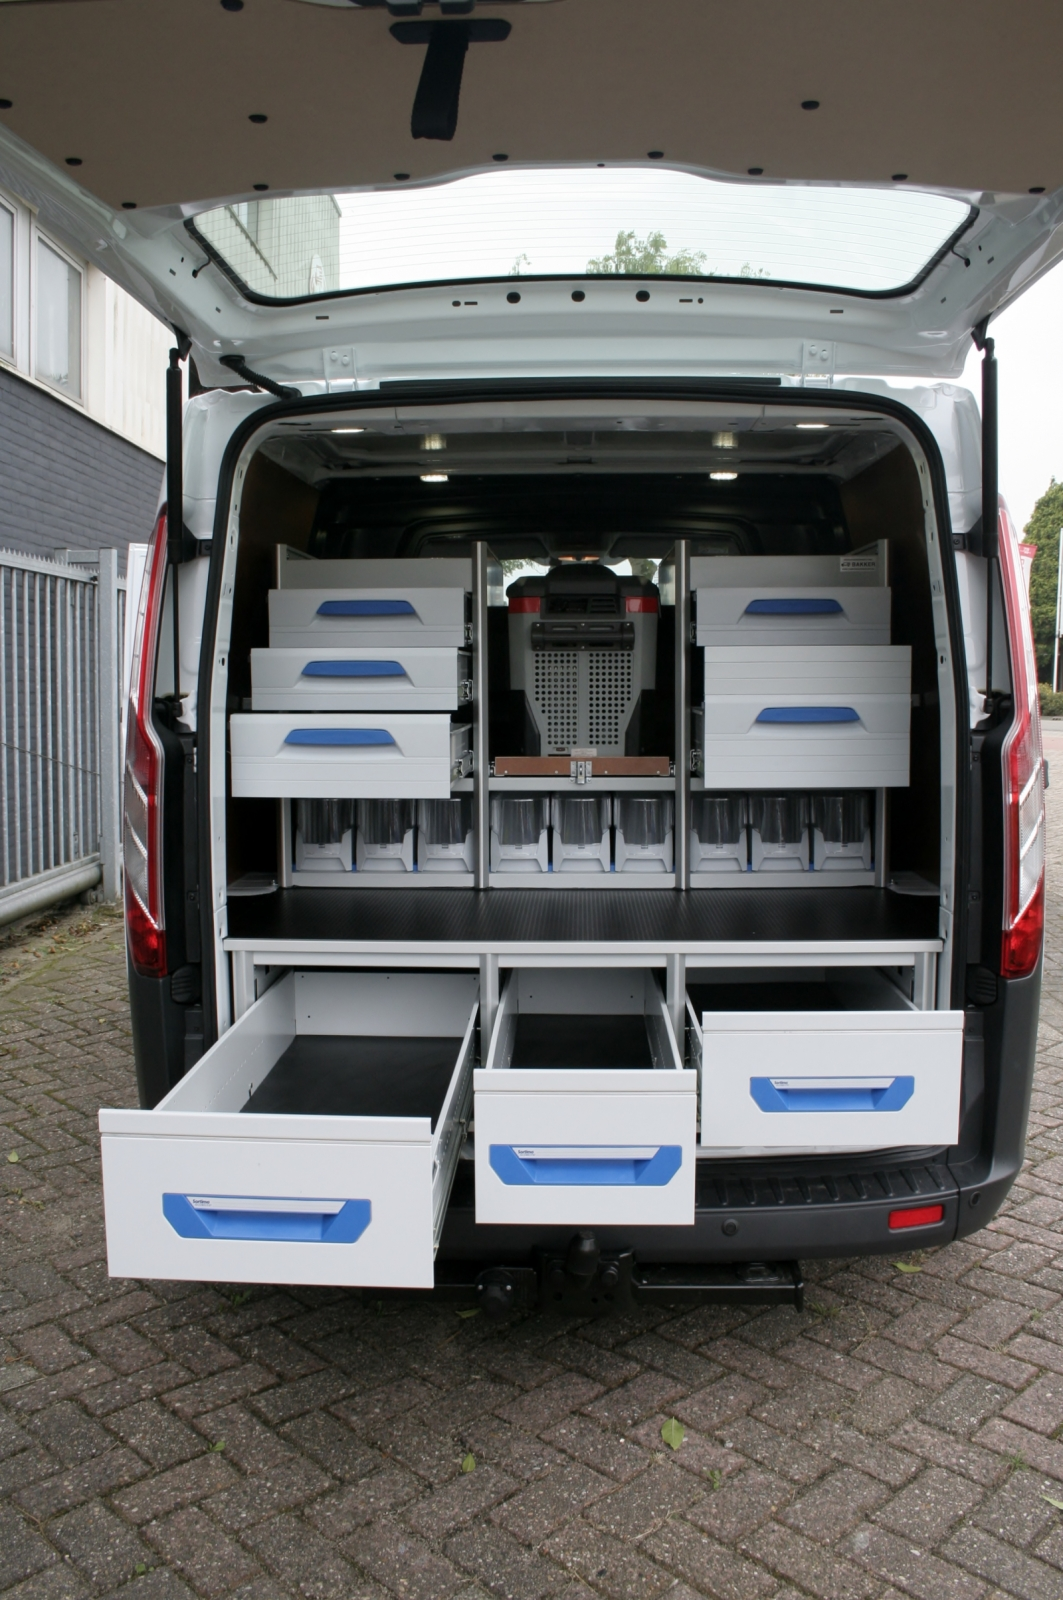 Fotogallery bedrijfswagen carrosserie bakker for Dimension interieur kangoo utilitaire